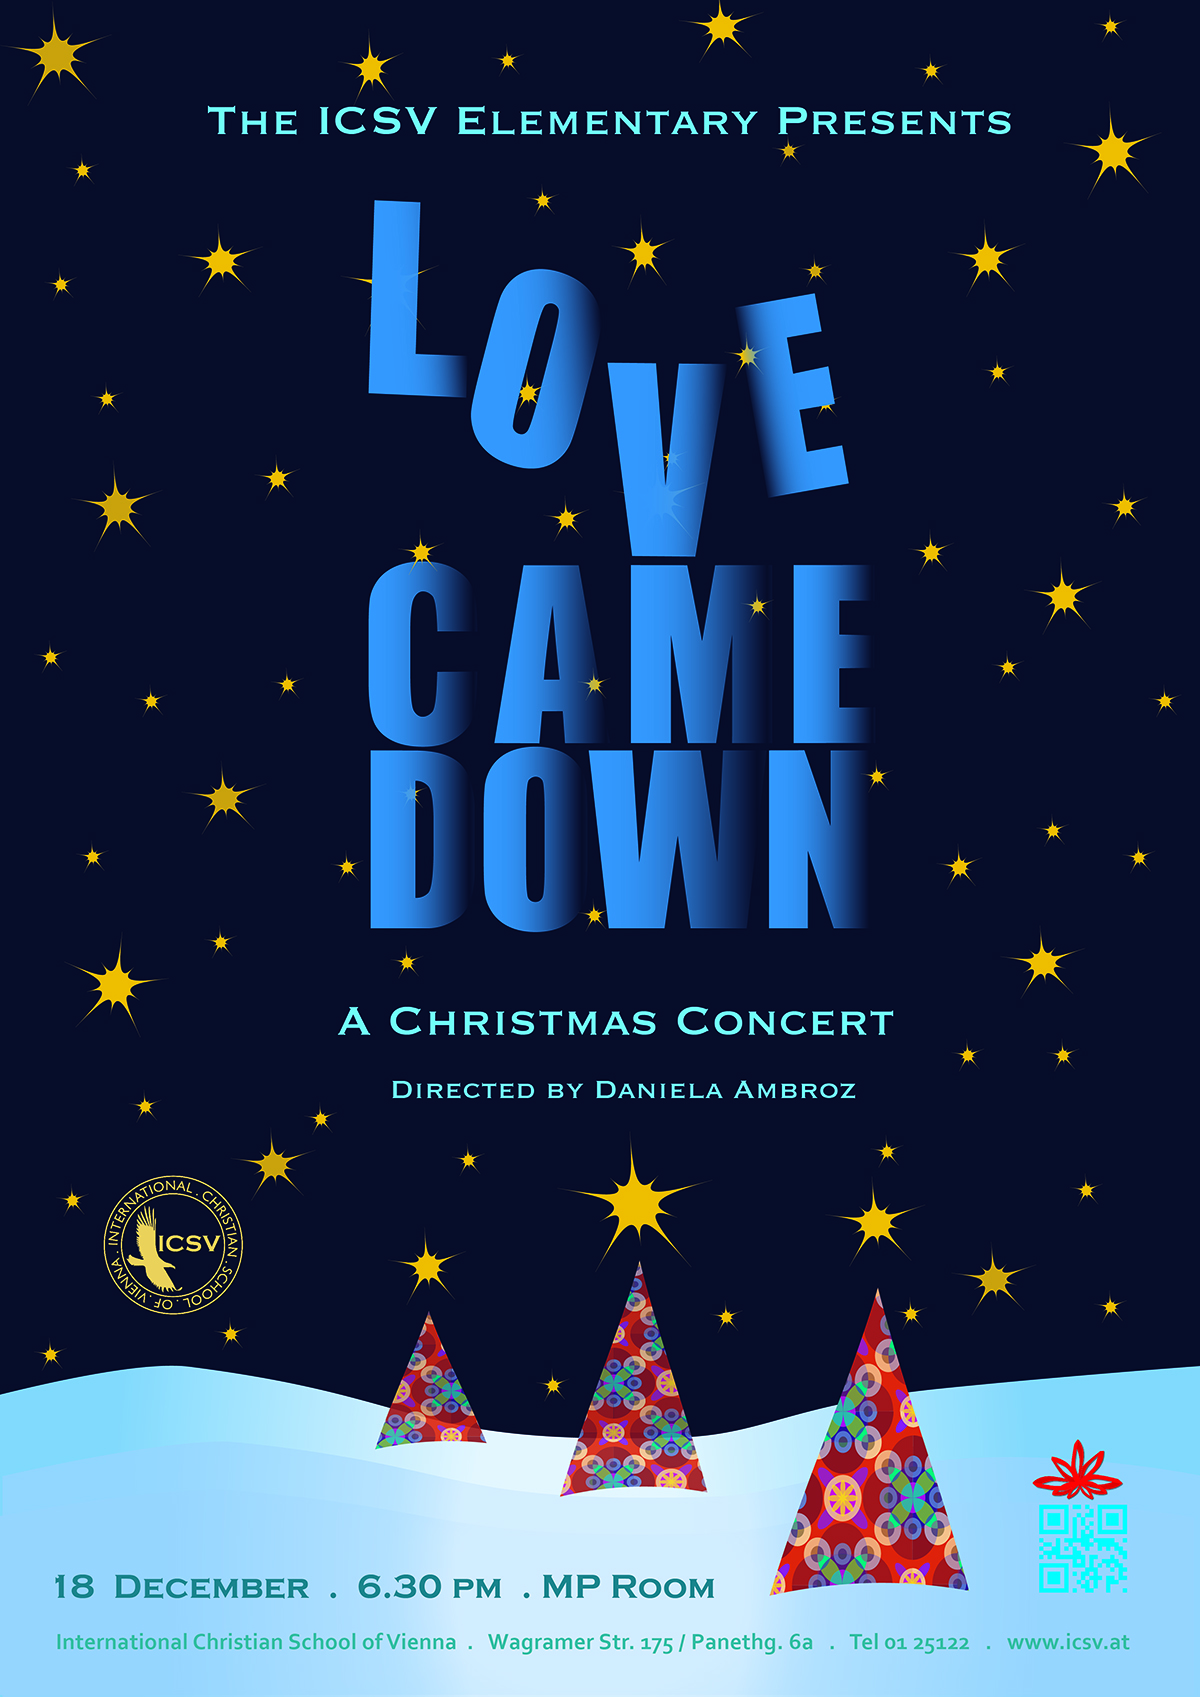 Christmas Poster.Icsv Elementary S 2013 Christmas Concert Poster Final